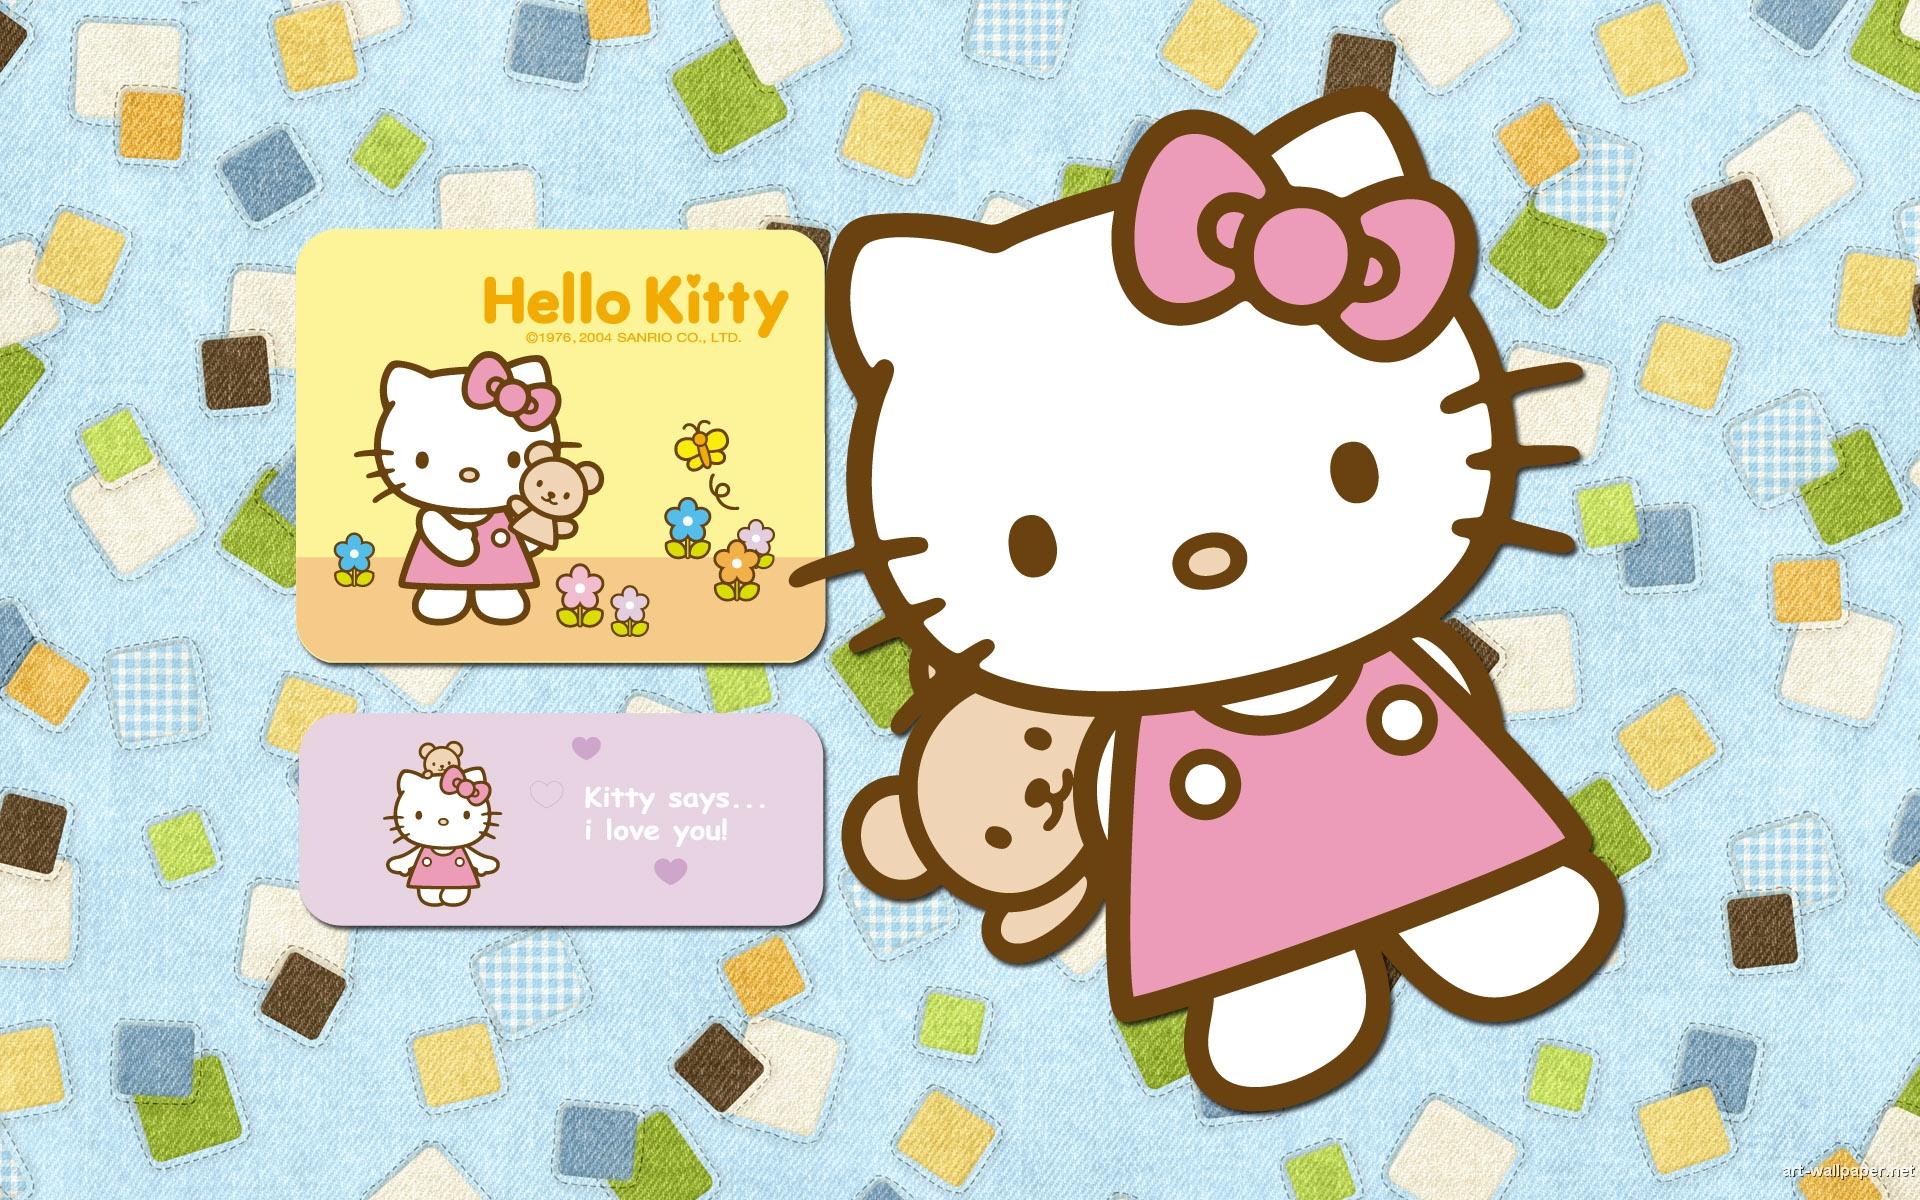 Download Wallpaper Hello Kitty Iphone 5 - Z0TKNt  Gallery_81521.jpg